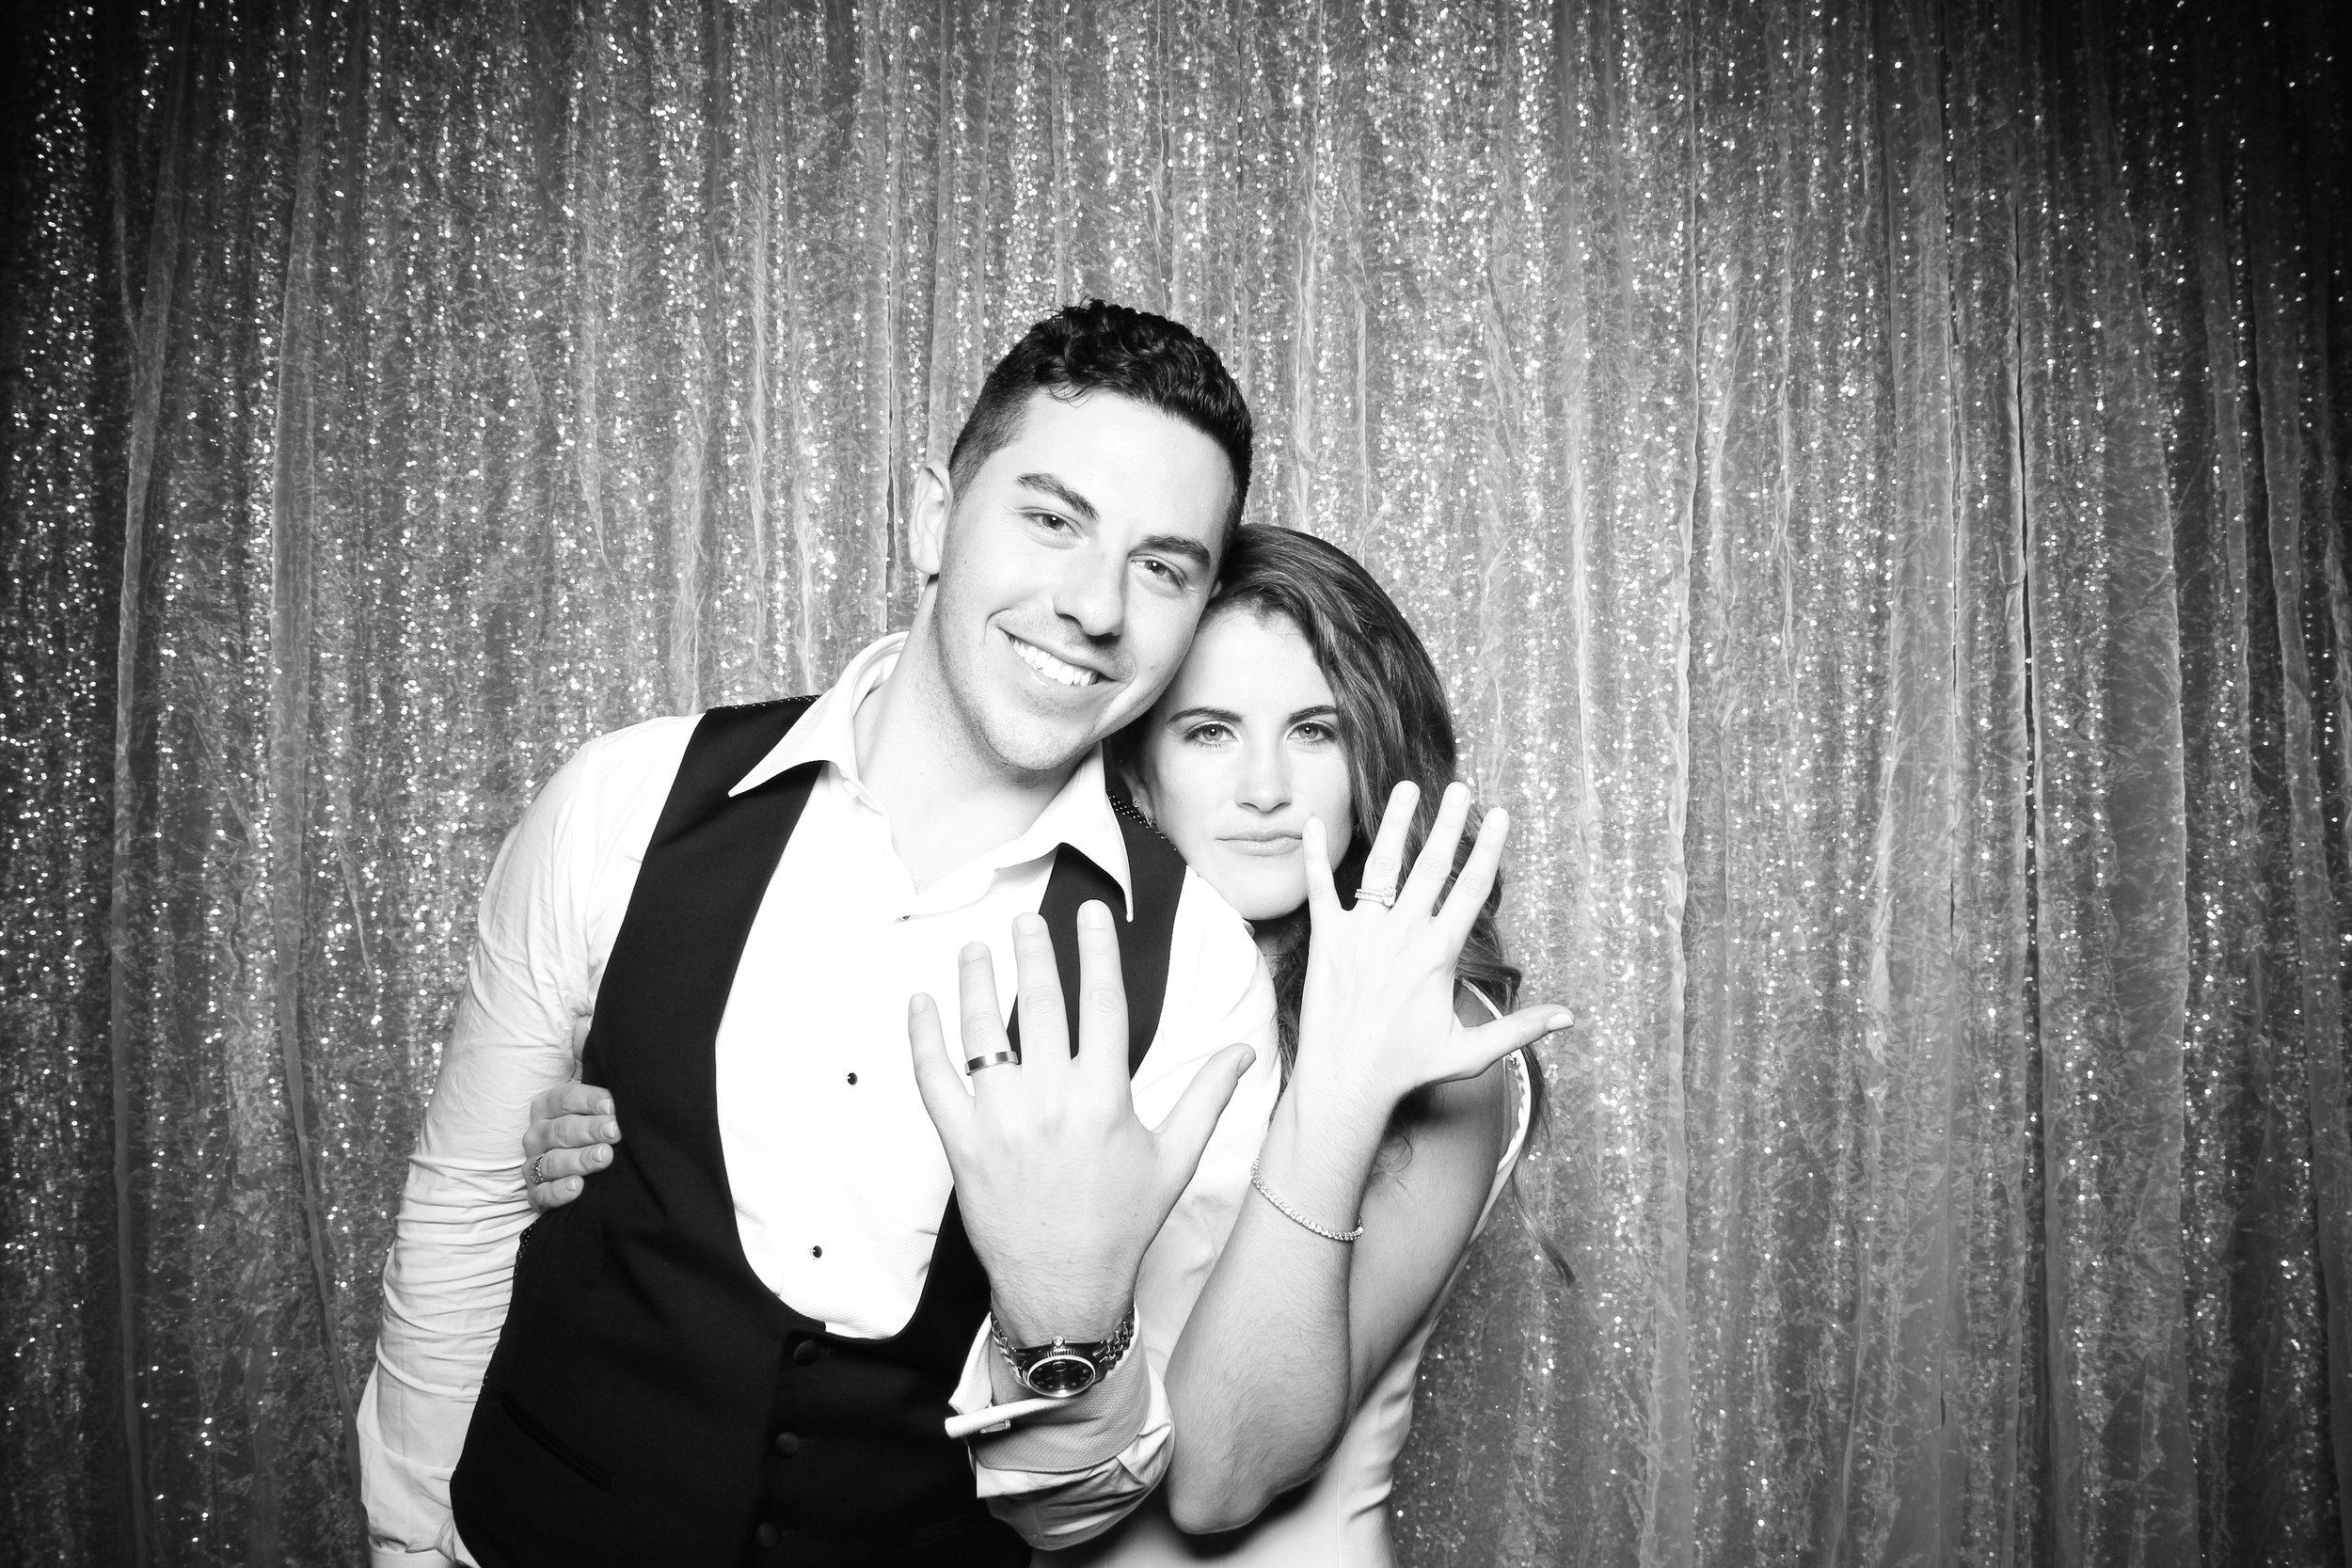 JW_Marriott_Burnham_Ballroom_Wedding_Photo_Booth_17.jpg